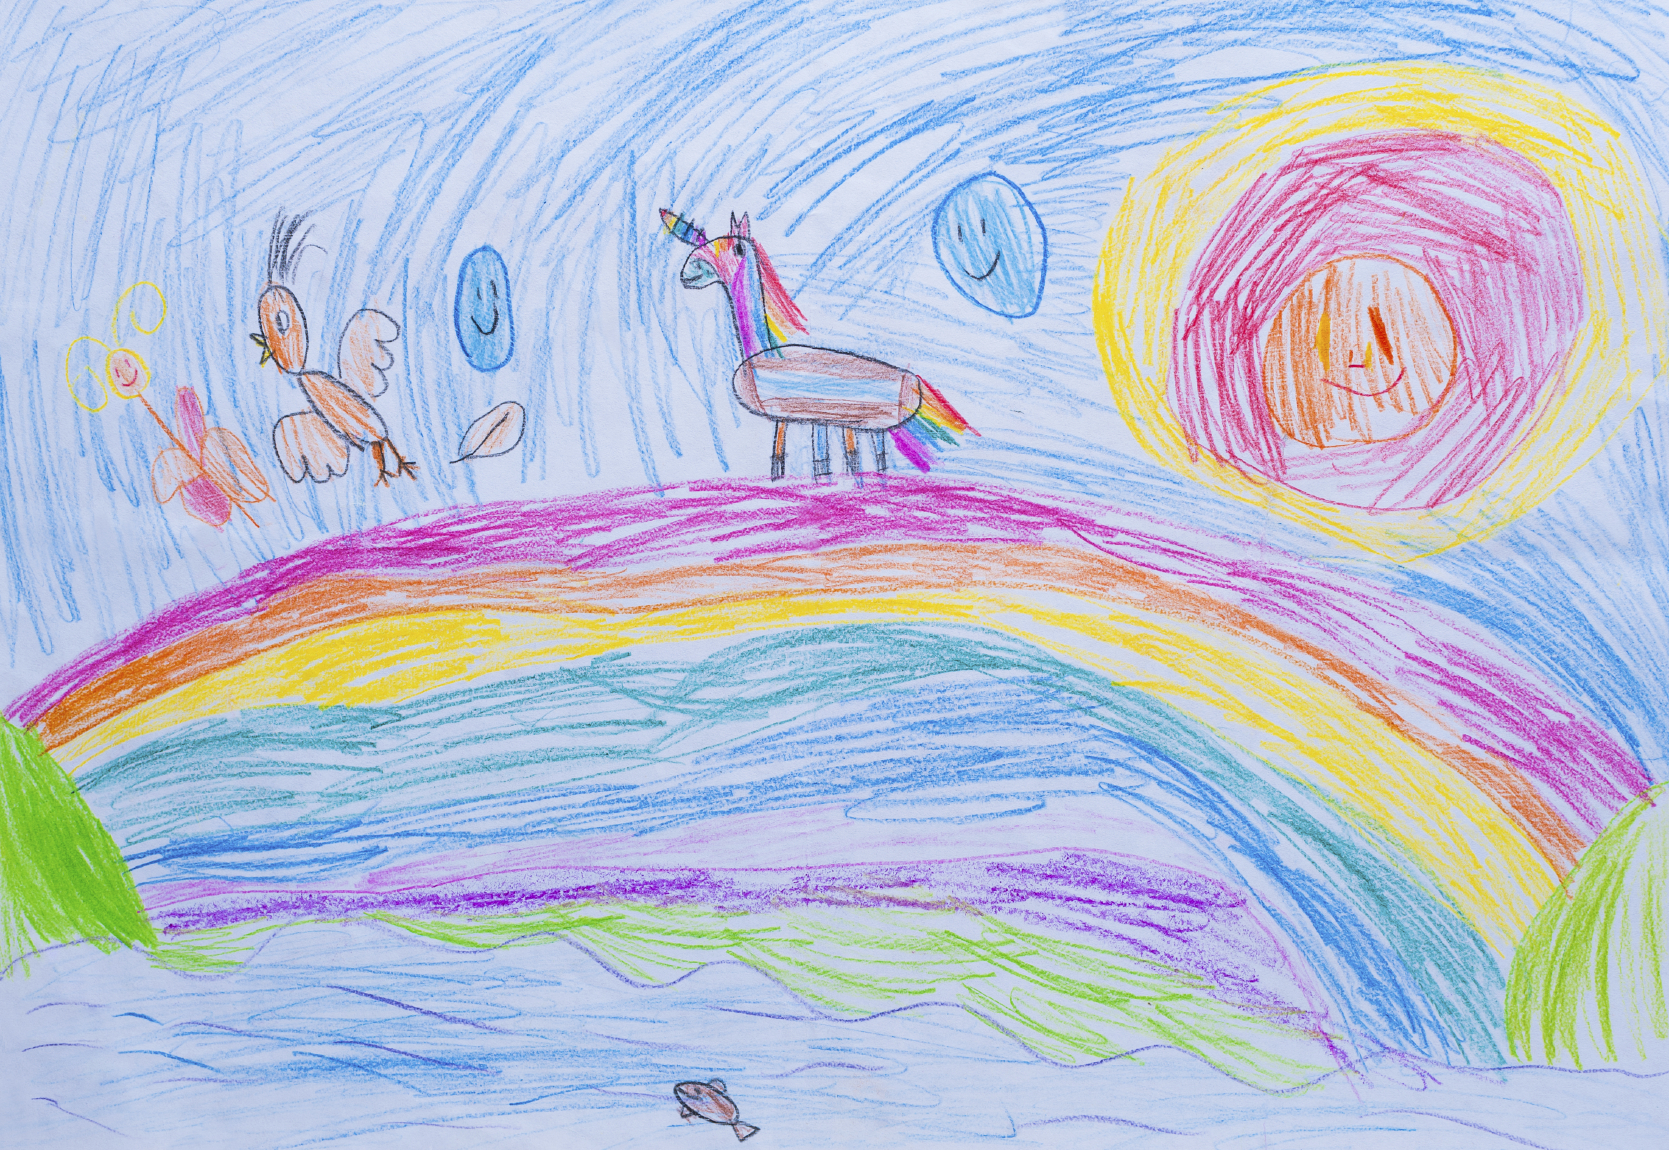 1669x1150 The Psychology Of Children's Artwork